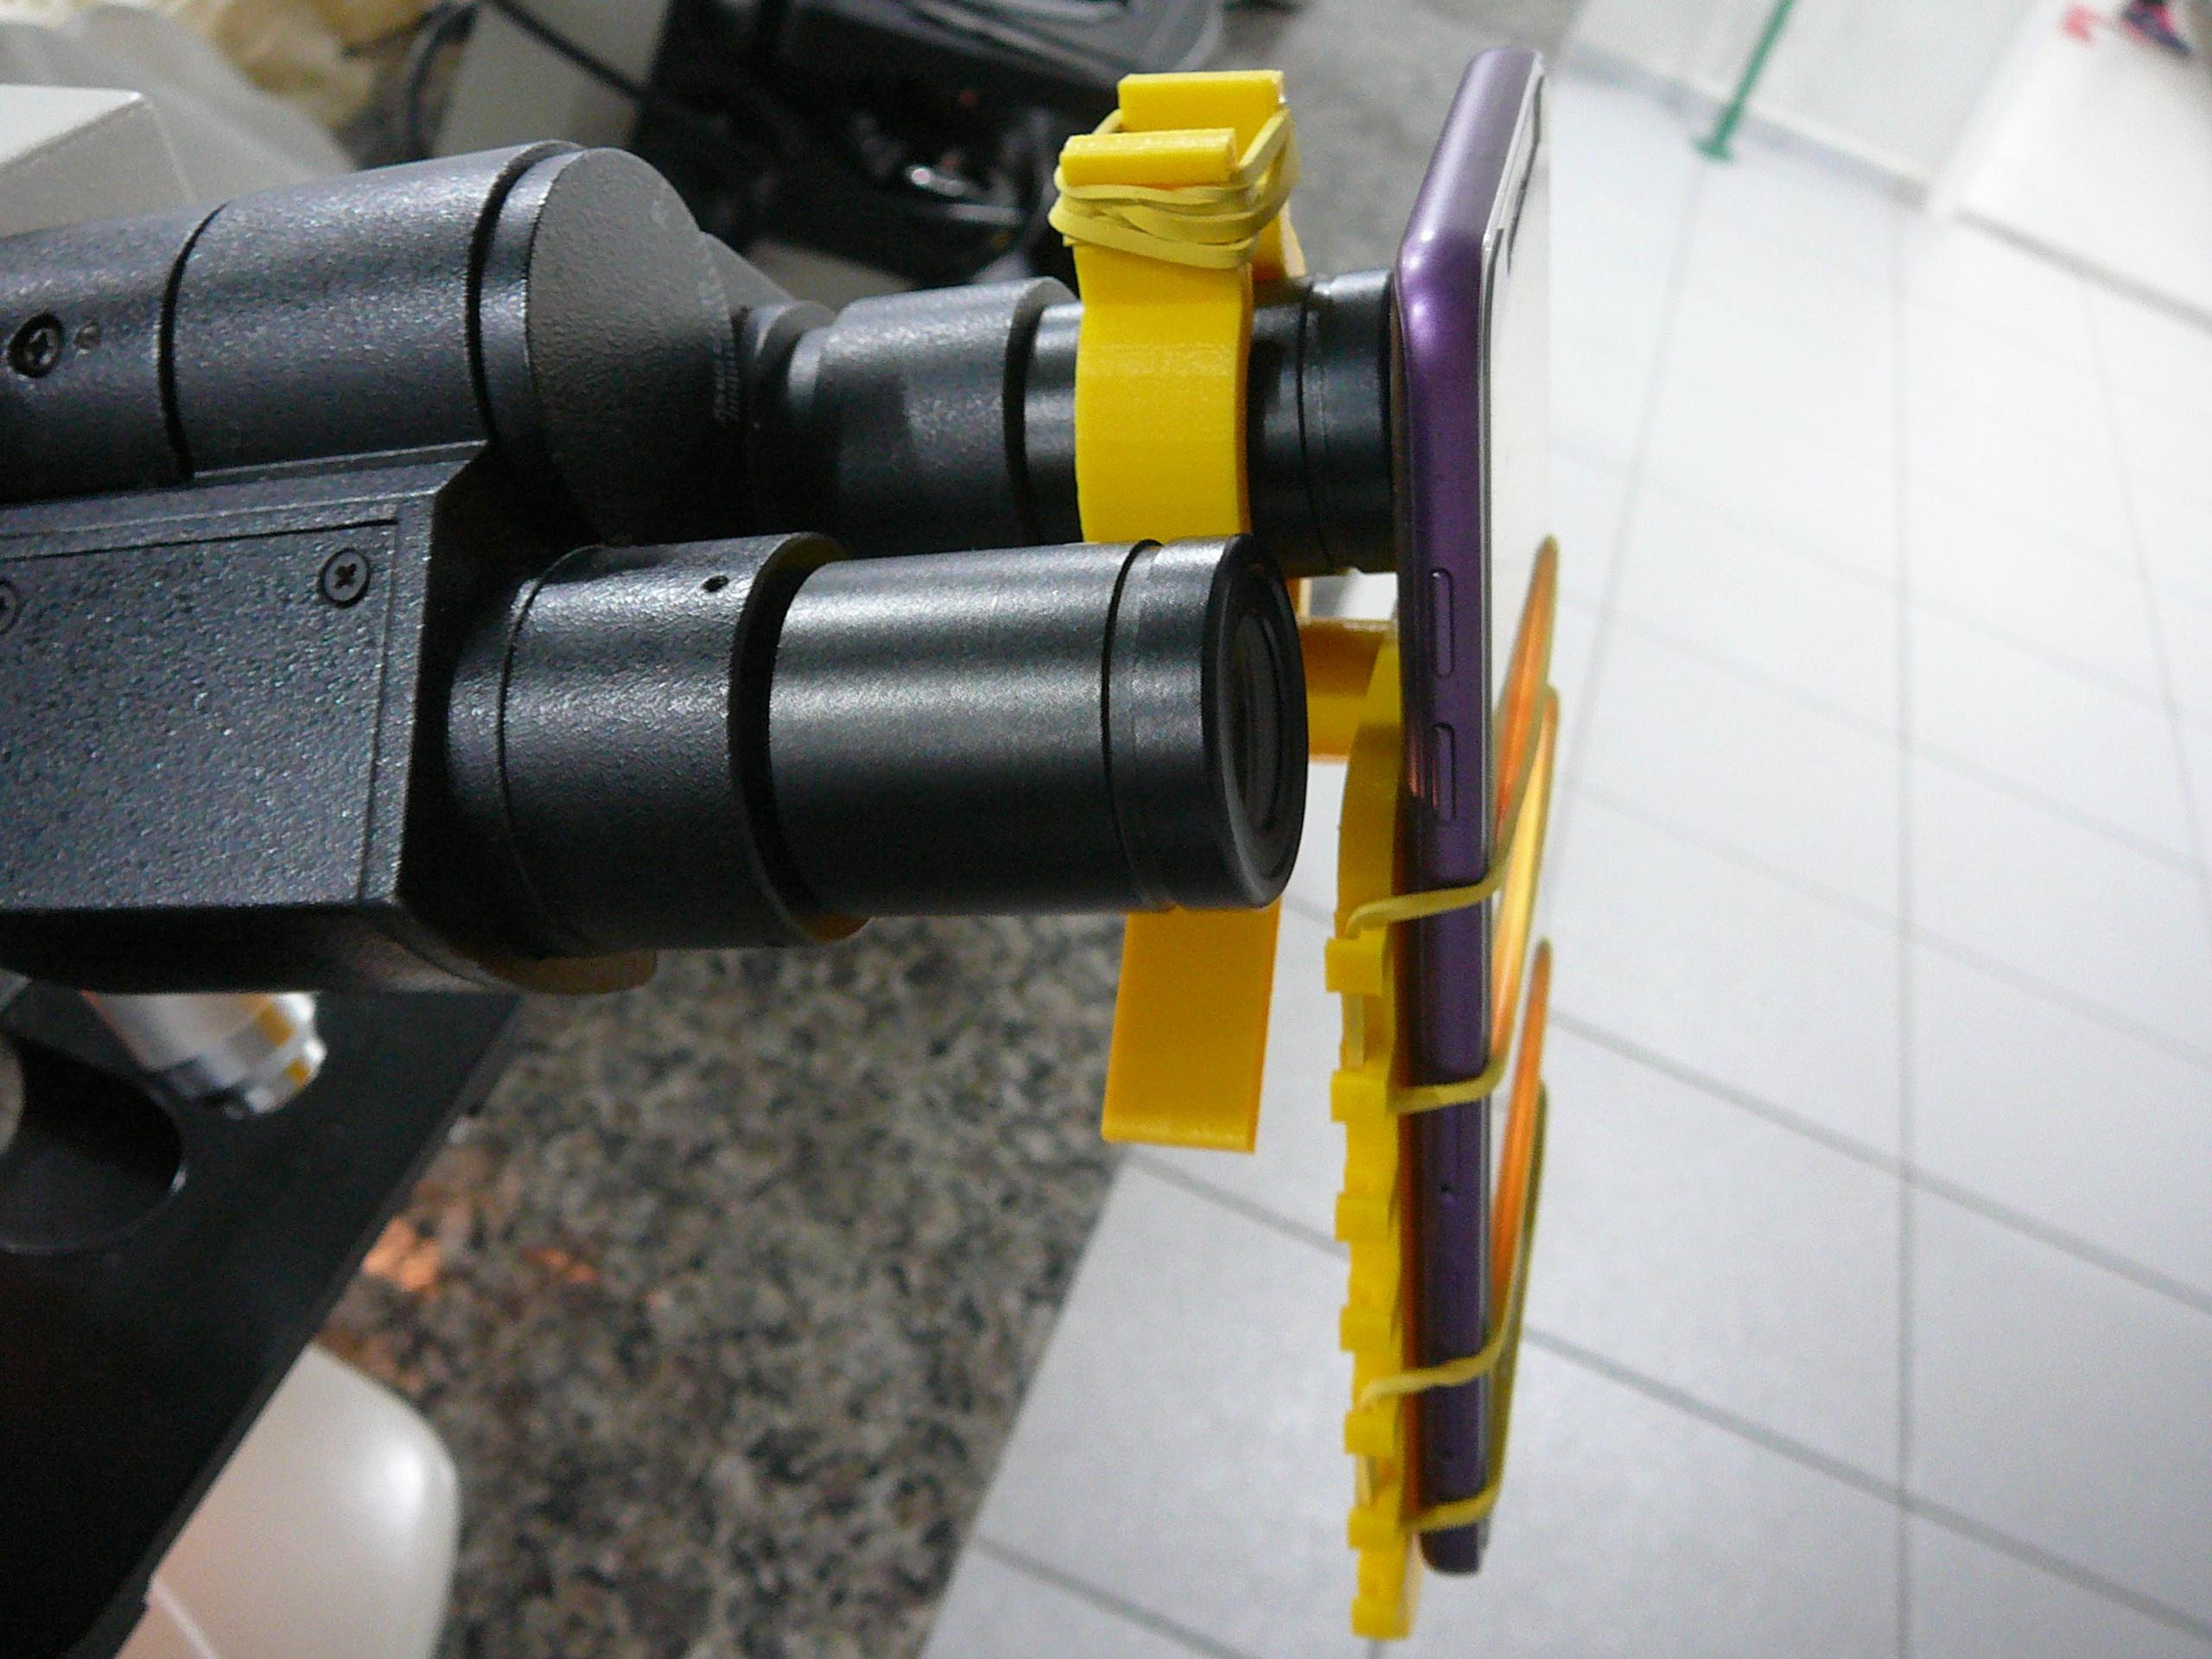 P1080941.JPG Download free STL file Microscope cell support - Suporte de celular para microscópio • 3D printer template, fabiomingori